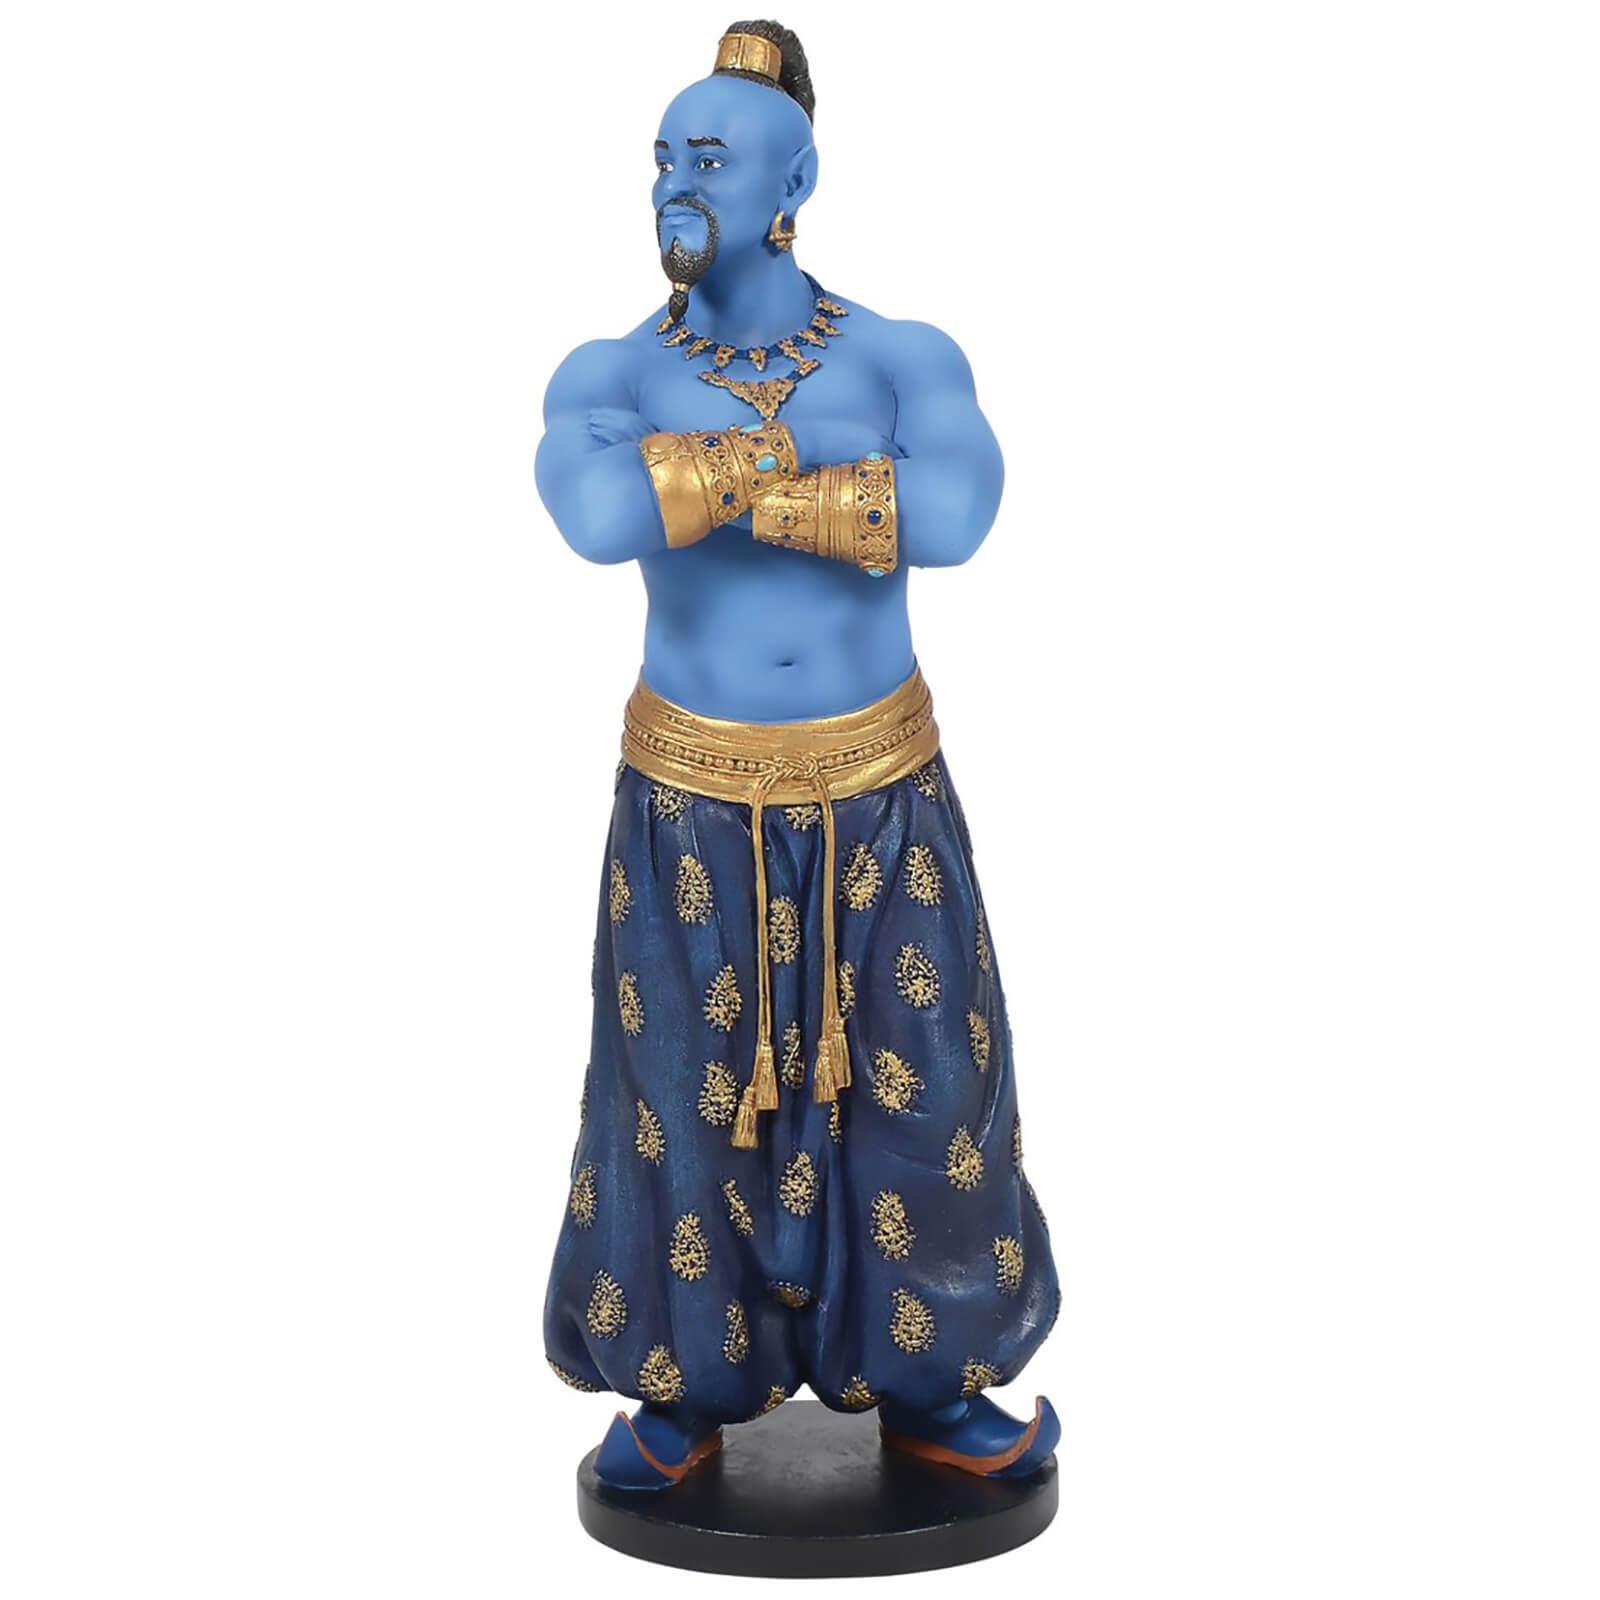 Image of Disney Showcase Collection Live Action Genie Figurine 22cm